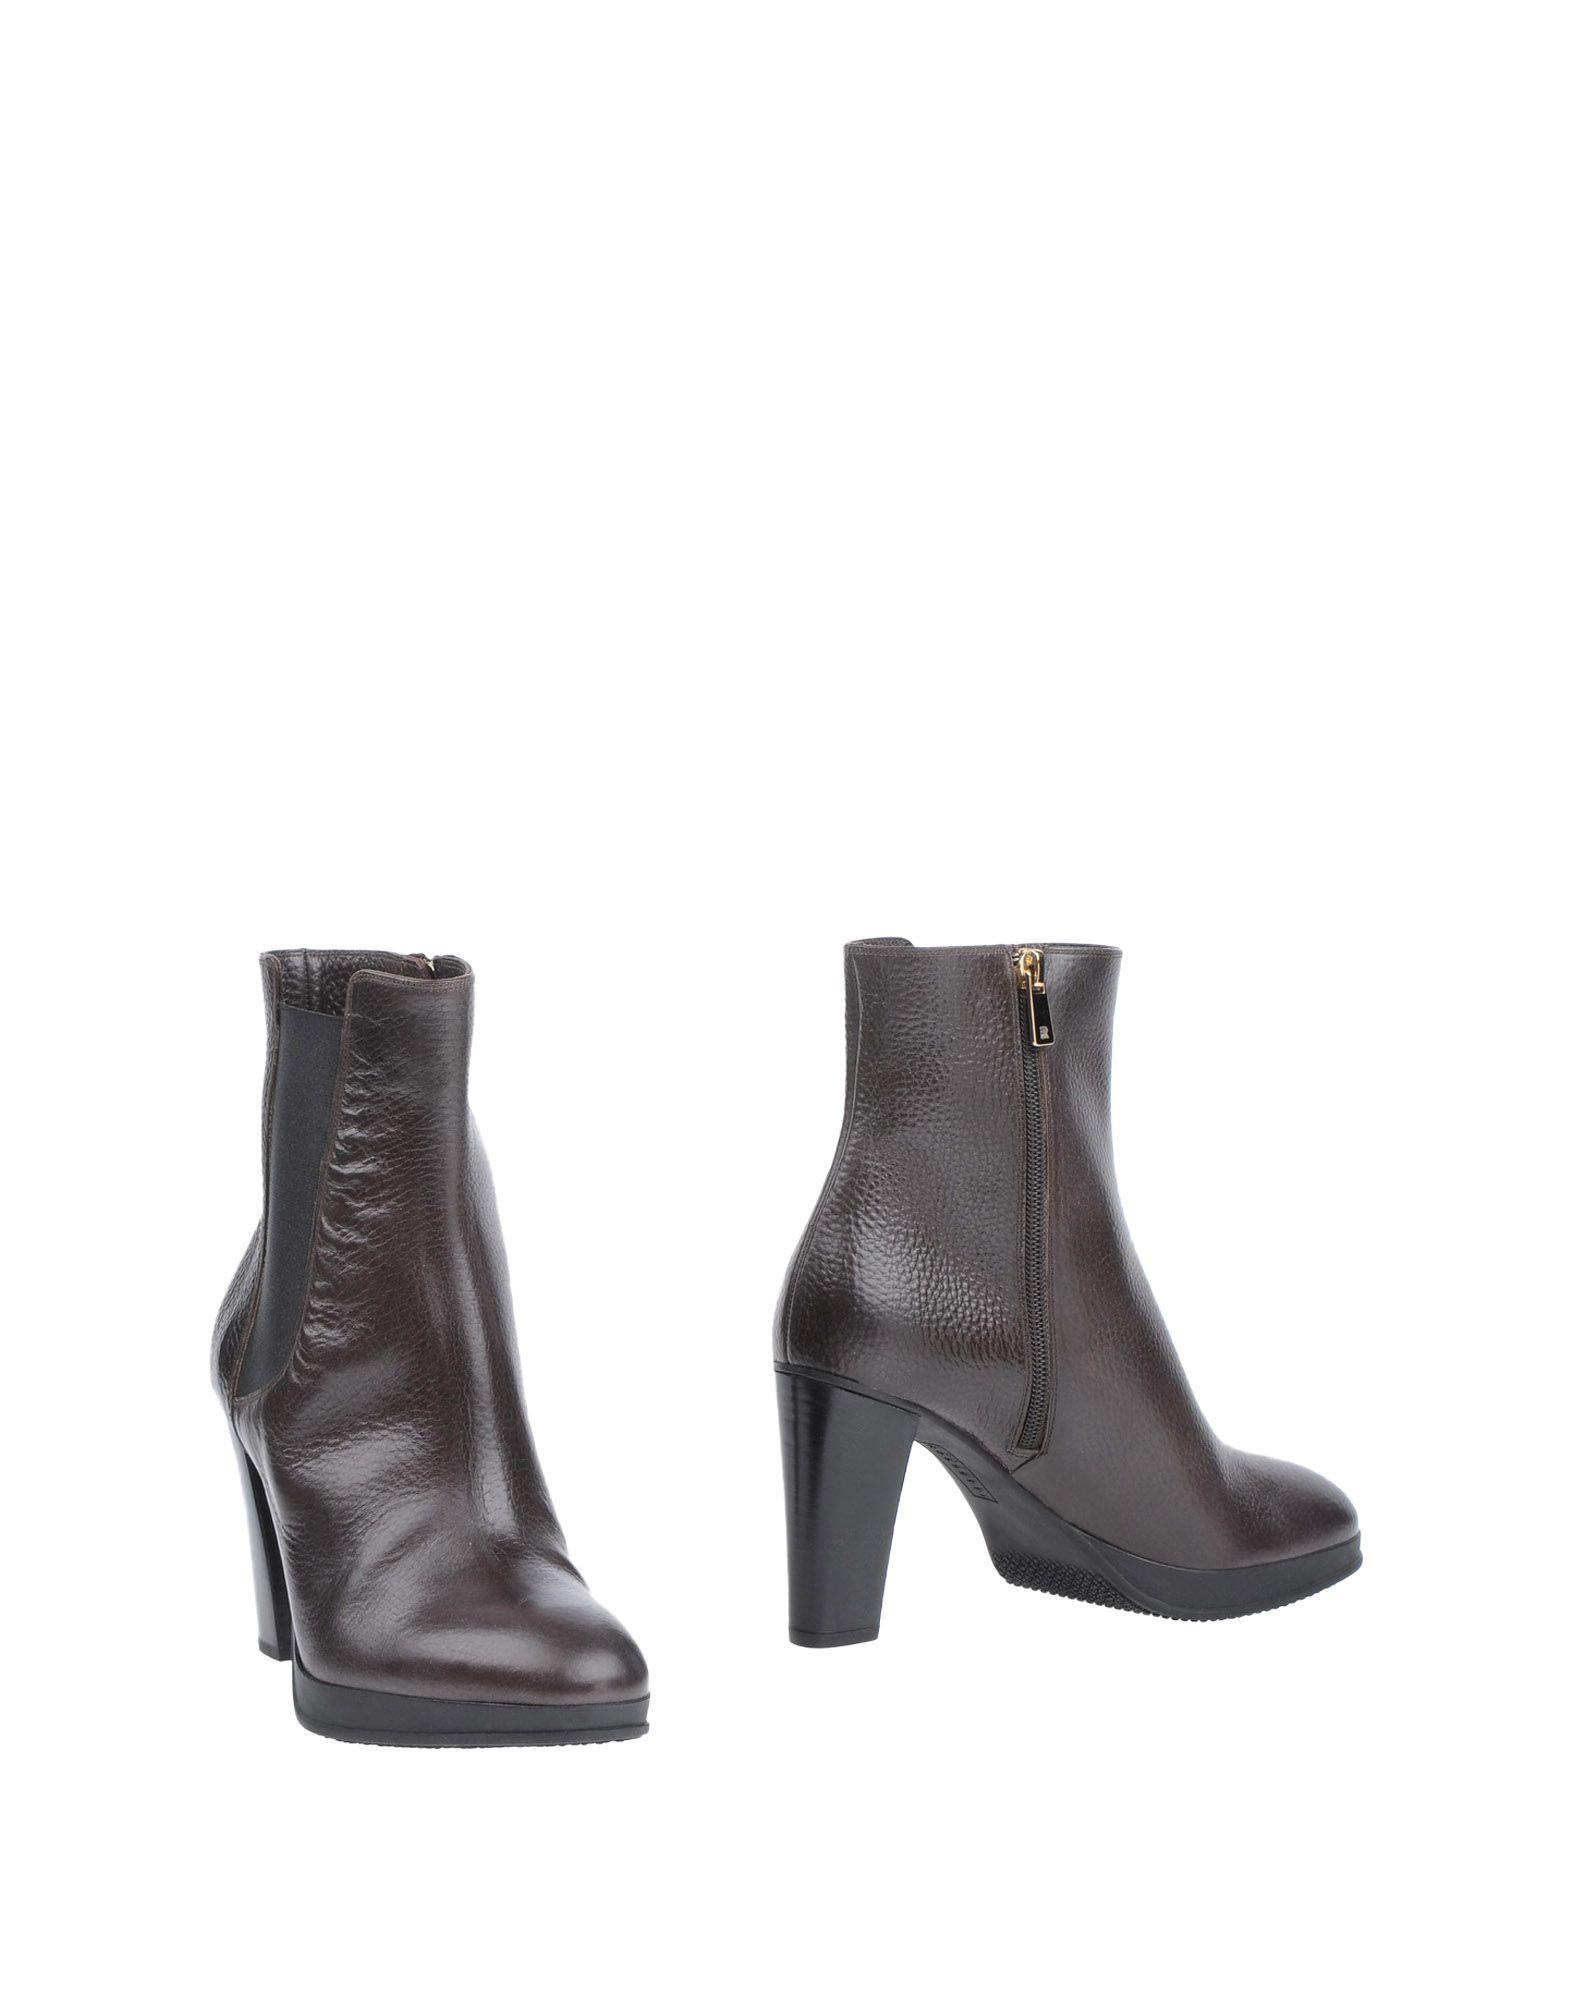 Fratelli 11332090TNGut Rossetti Stiefelette Damen  11332090TNGut Fratelli aussehende strapazierfähige Schuhe 9d67b8